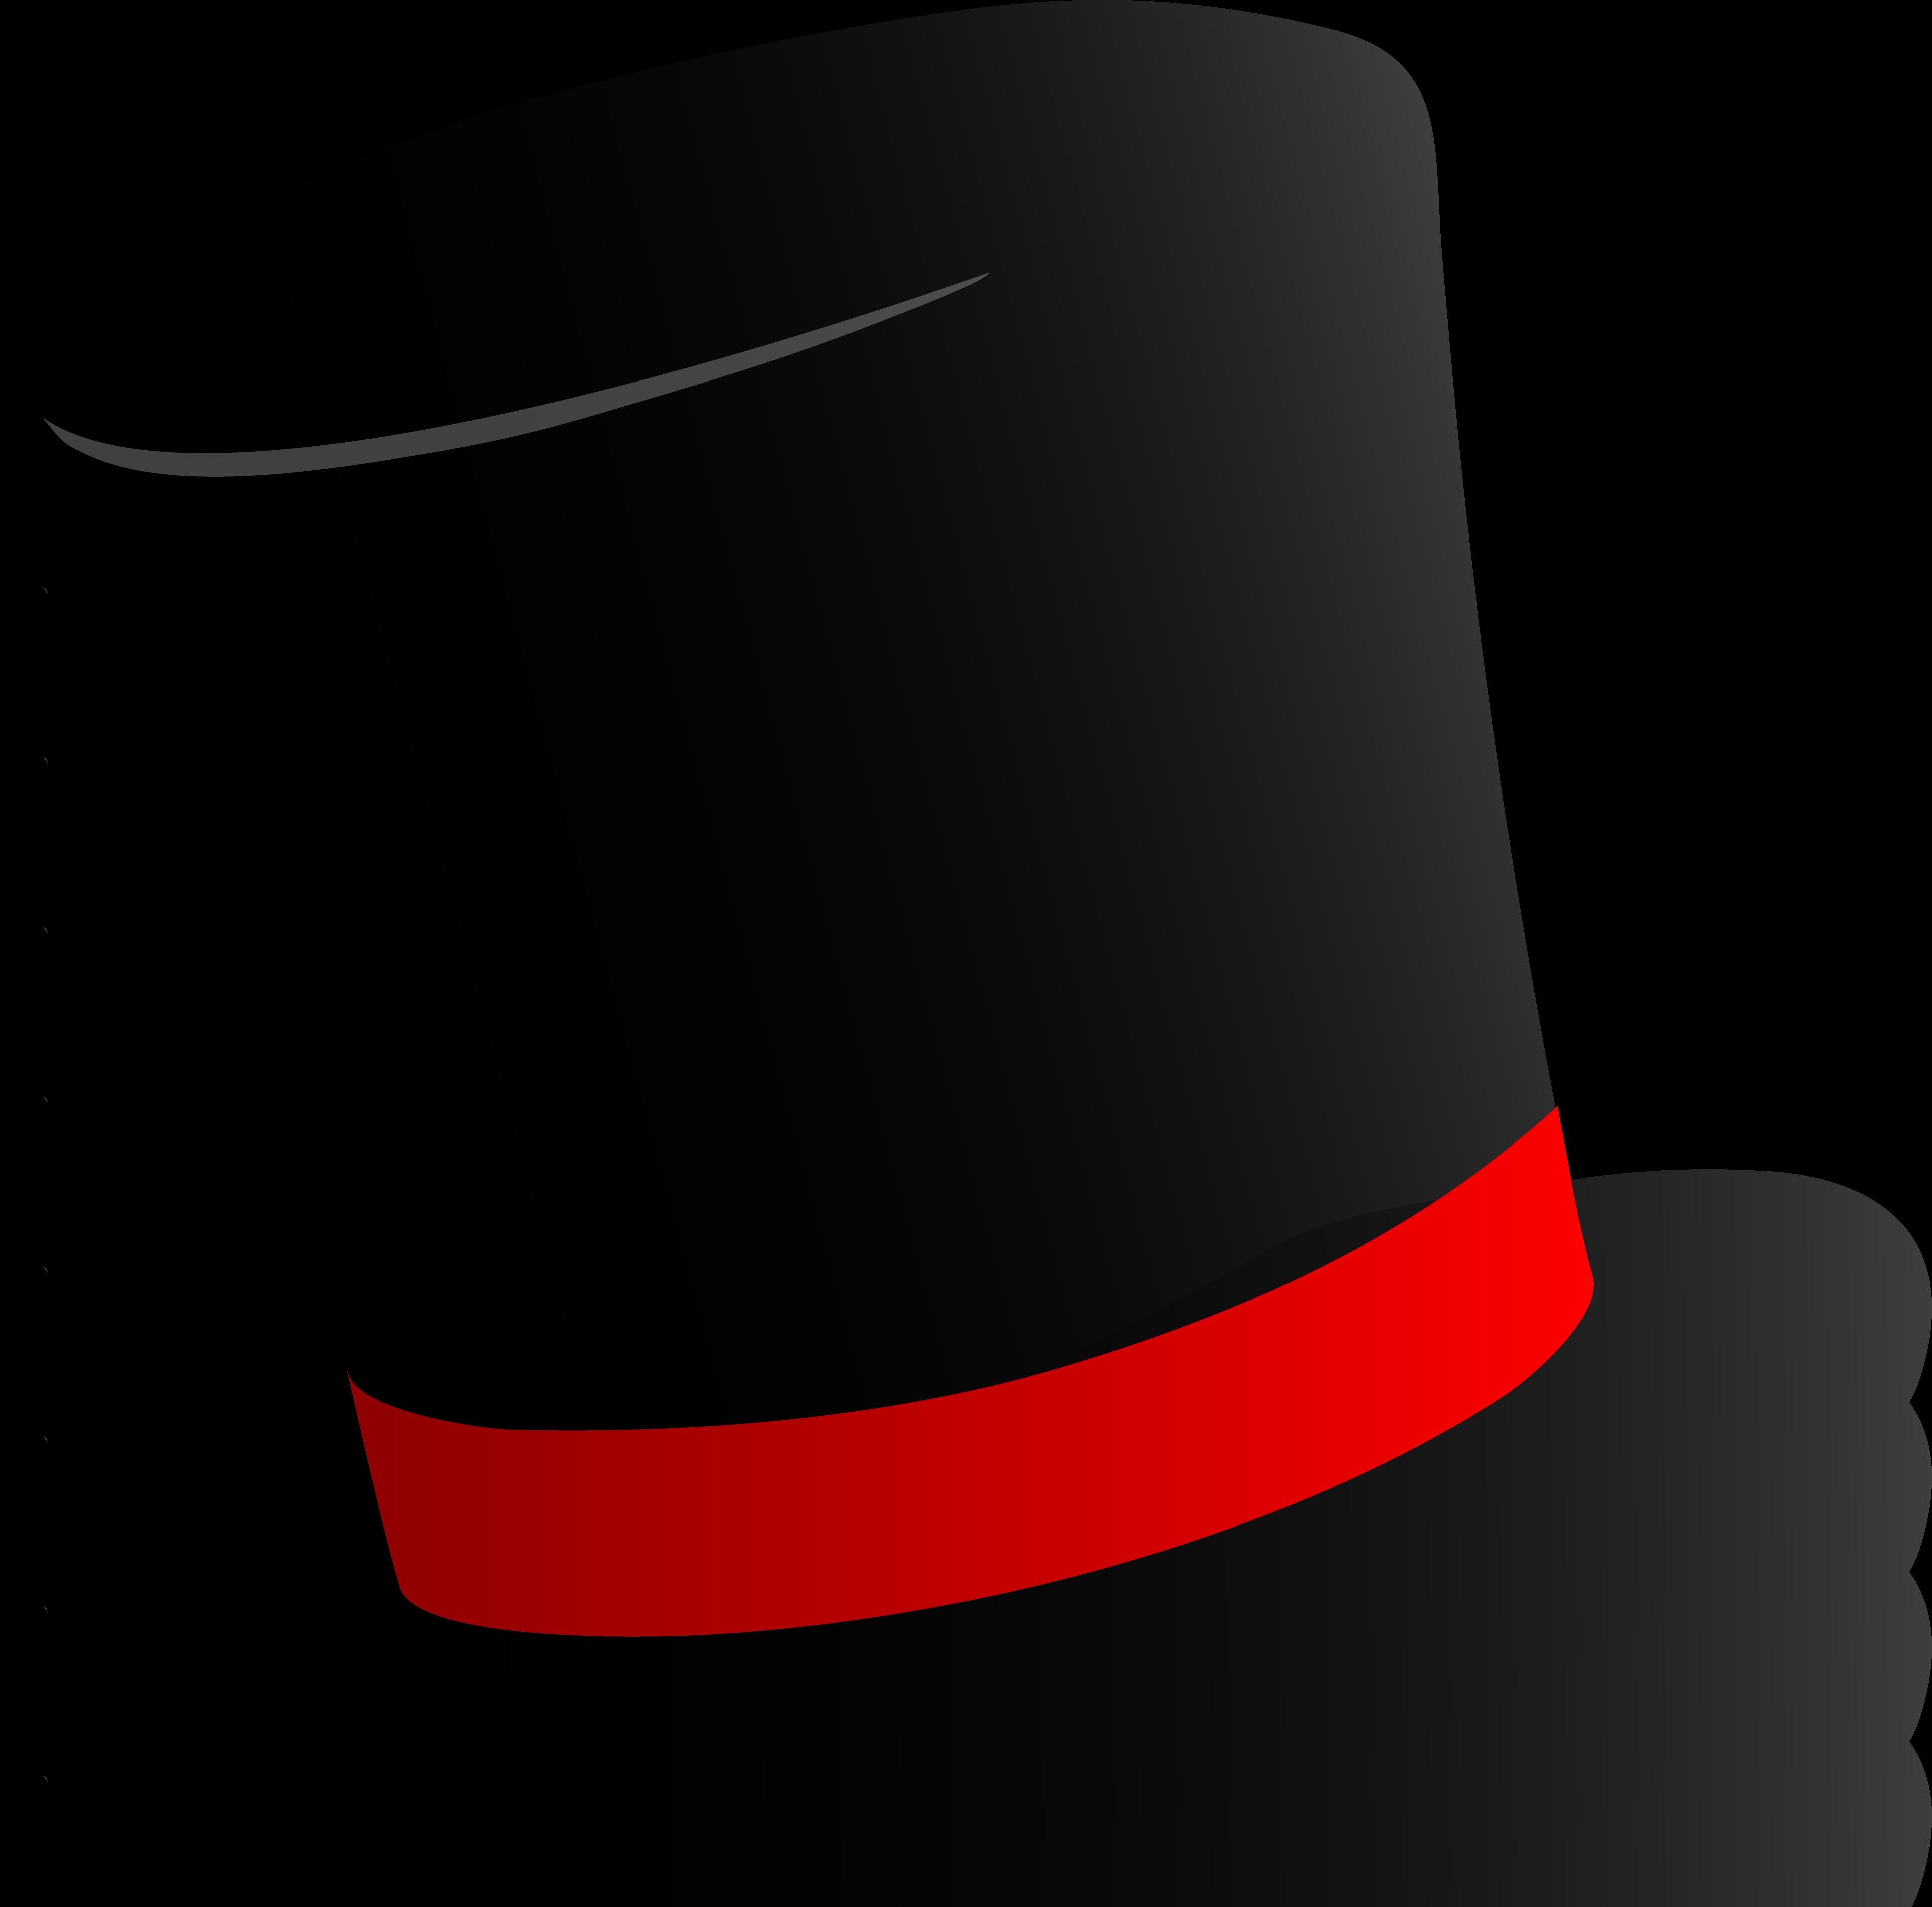 dbe4913403d21 Black Top Hat Design - Free Clip Art